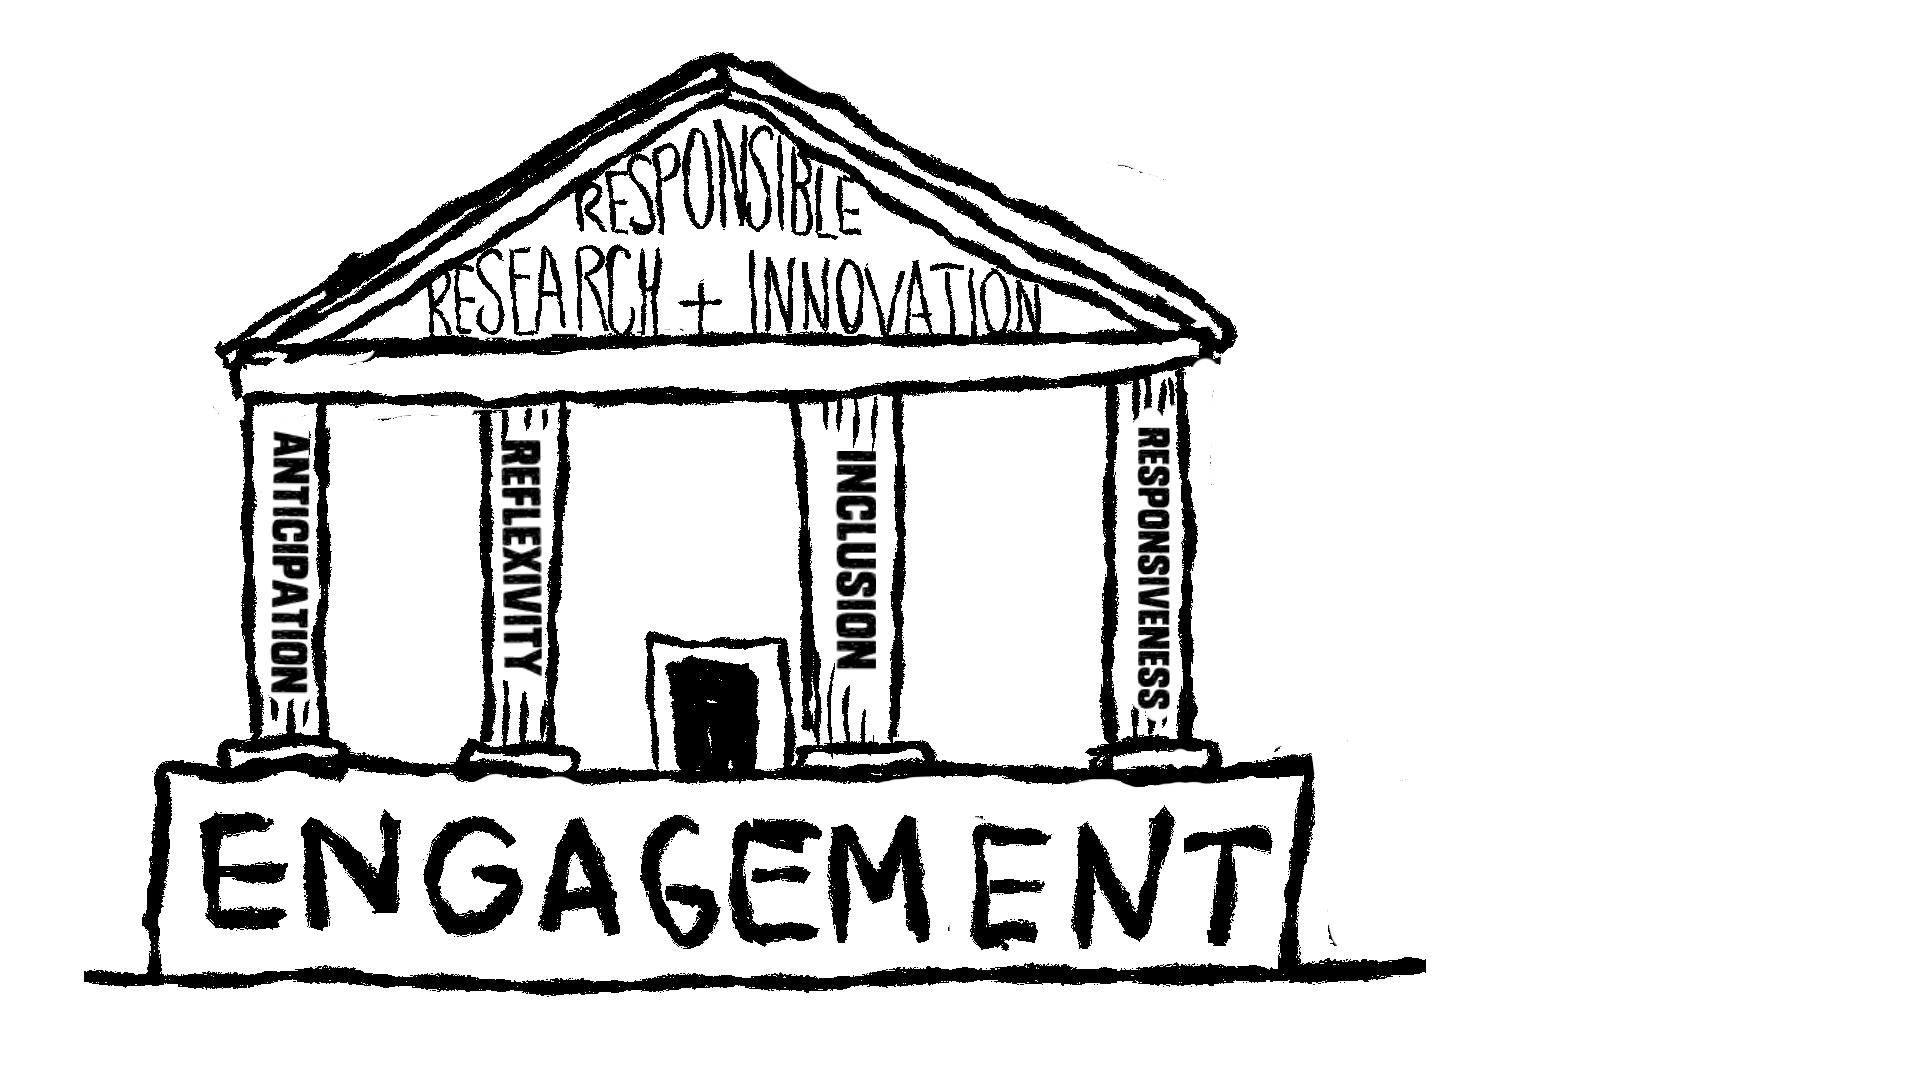 Engagement pillars